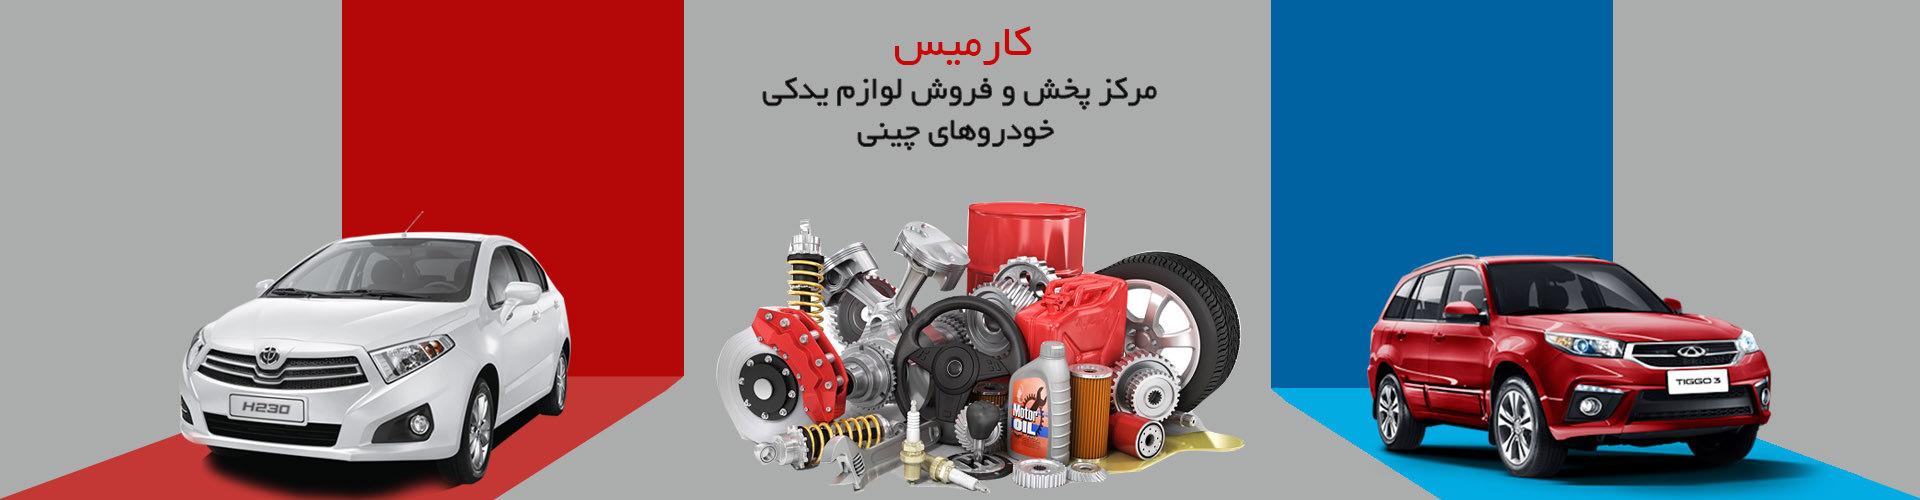 carmis.spare .parts .car